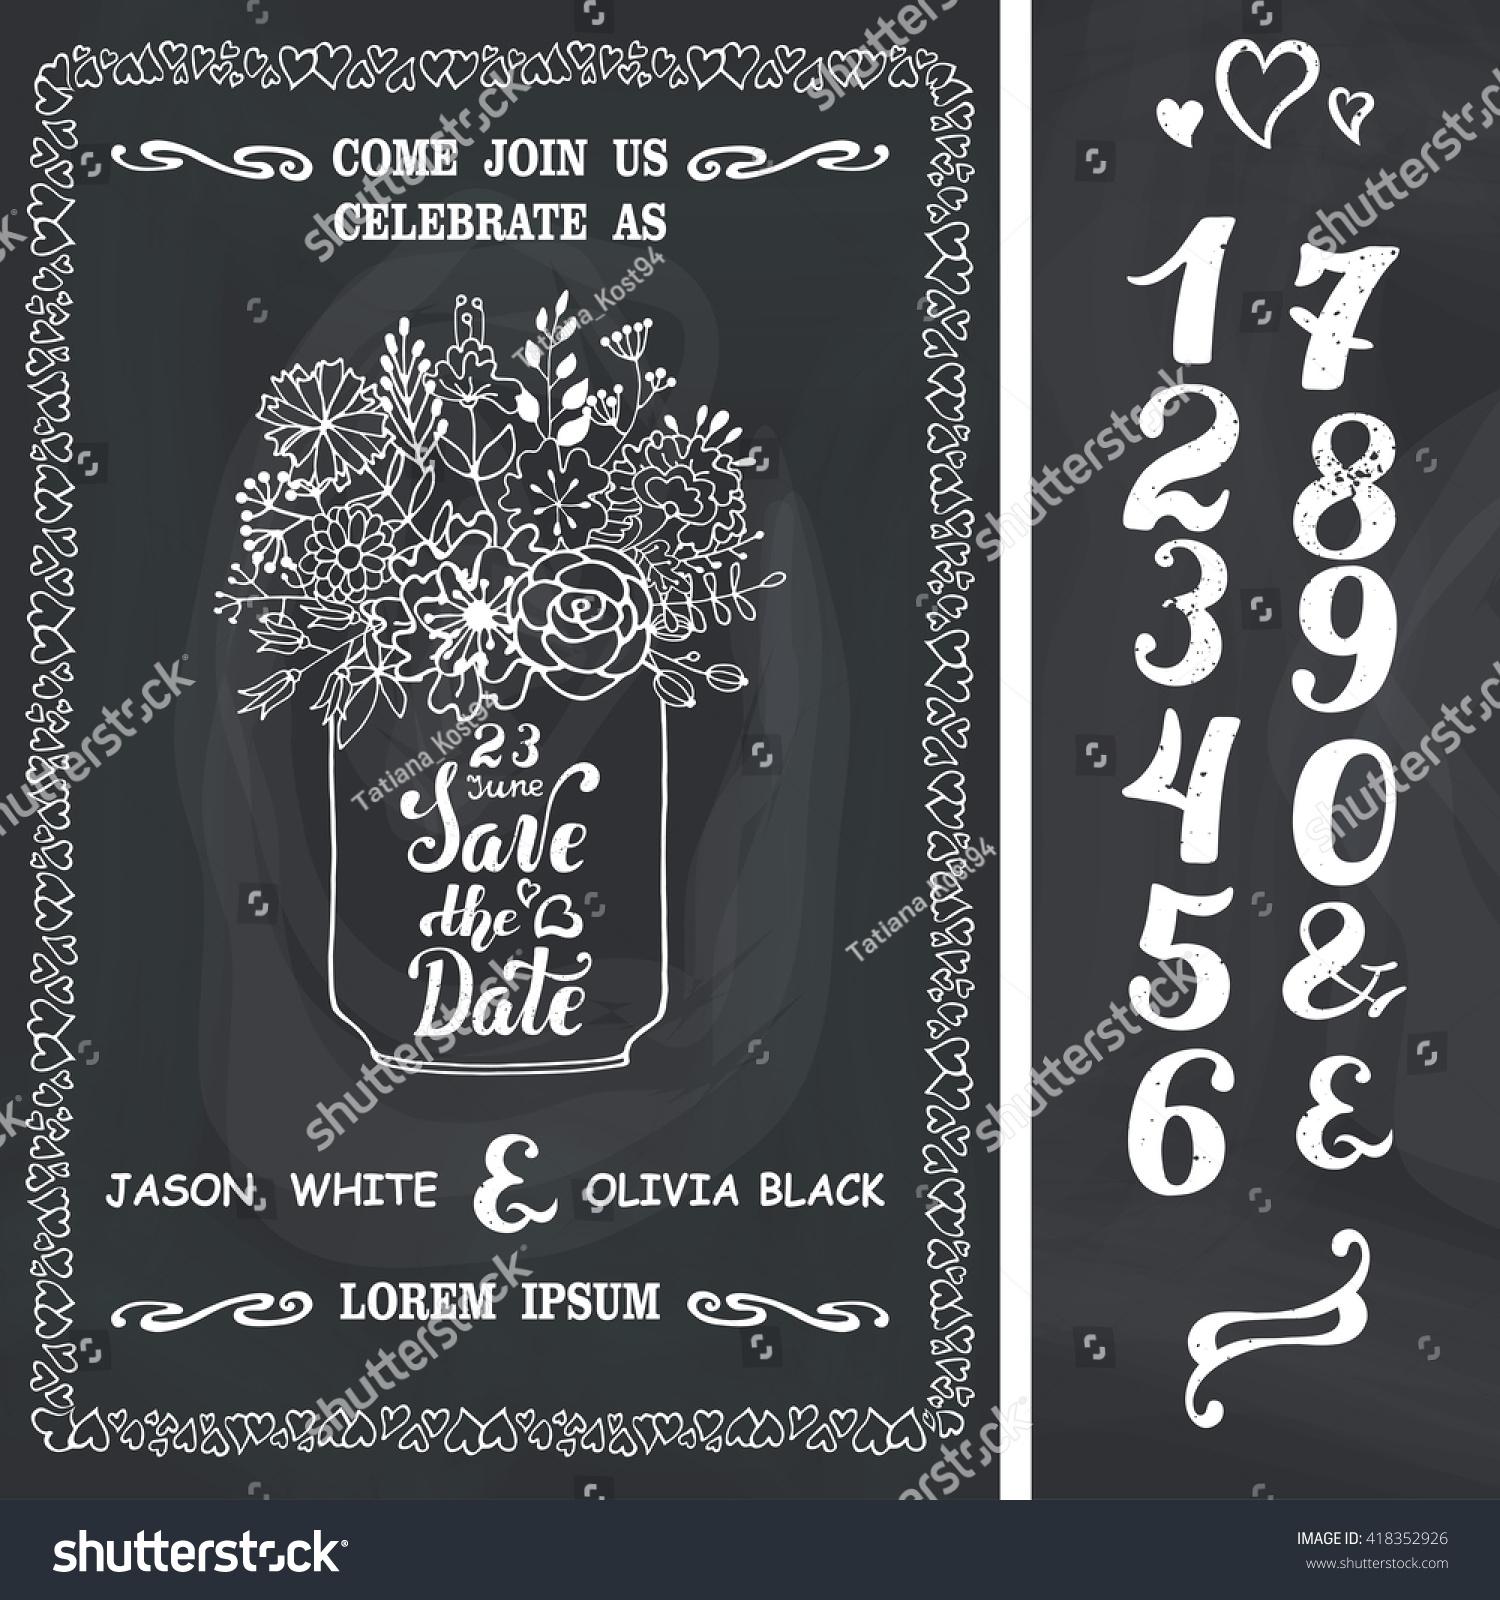 Wedding Save Date Wedding Invitation Card Doodle Stock Vector (2018 ...